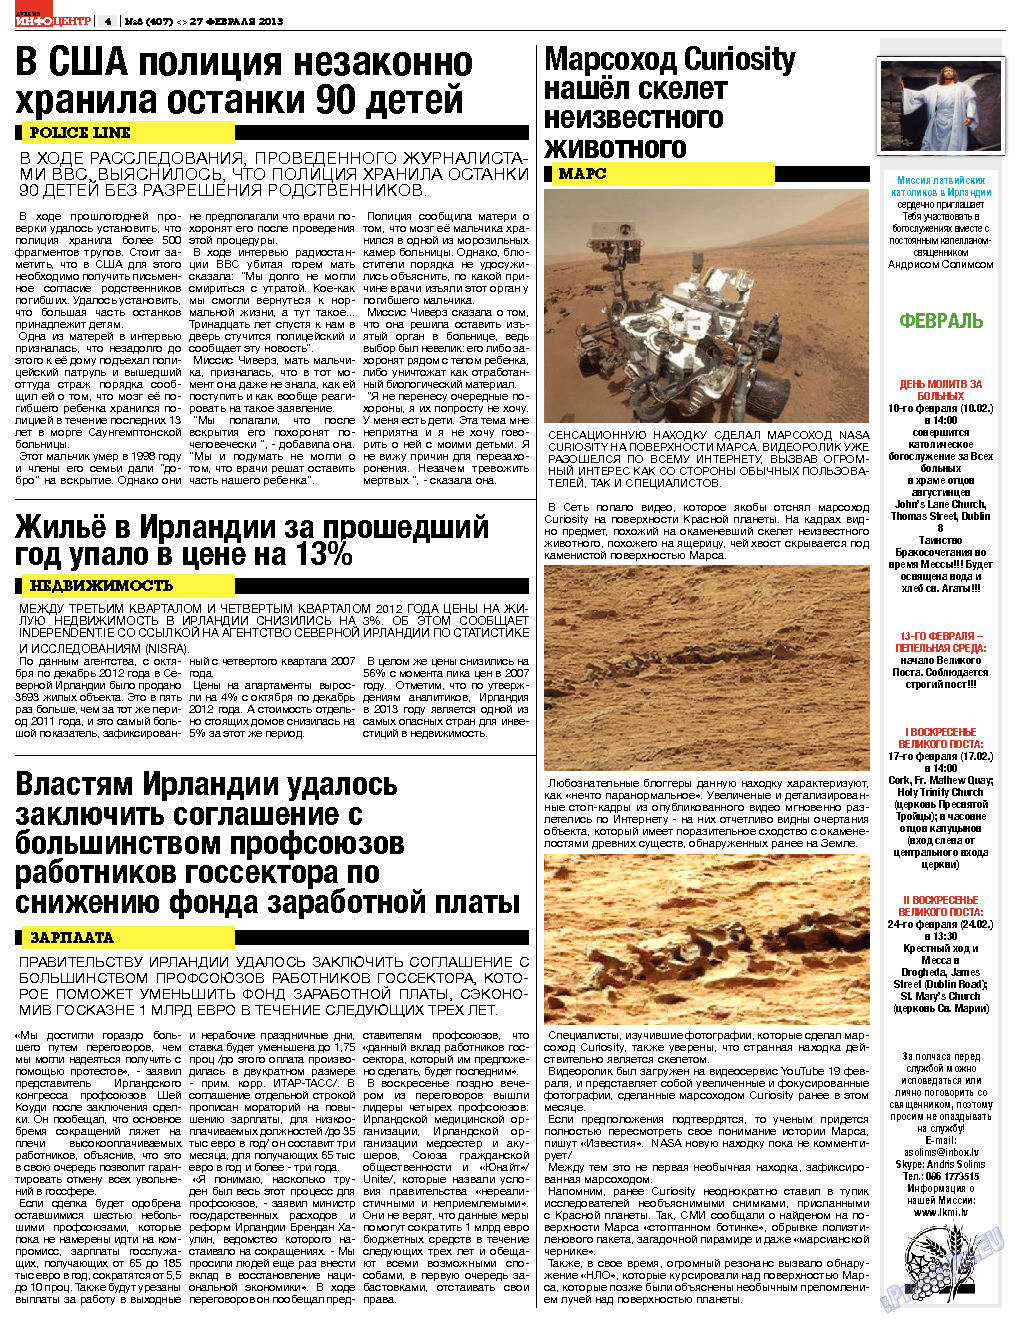 Дублин инфоцентр (газета). 2013 год, номер 8, стр. 4